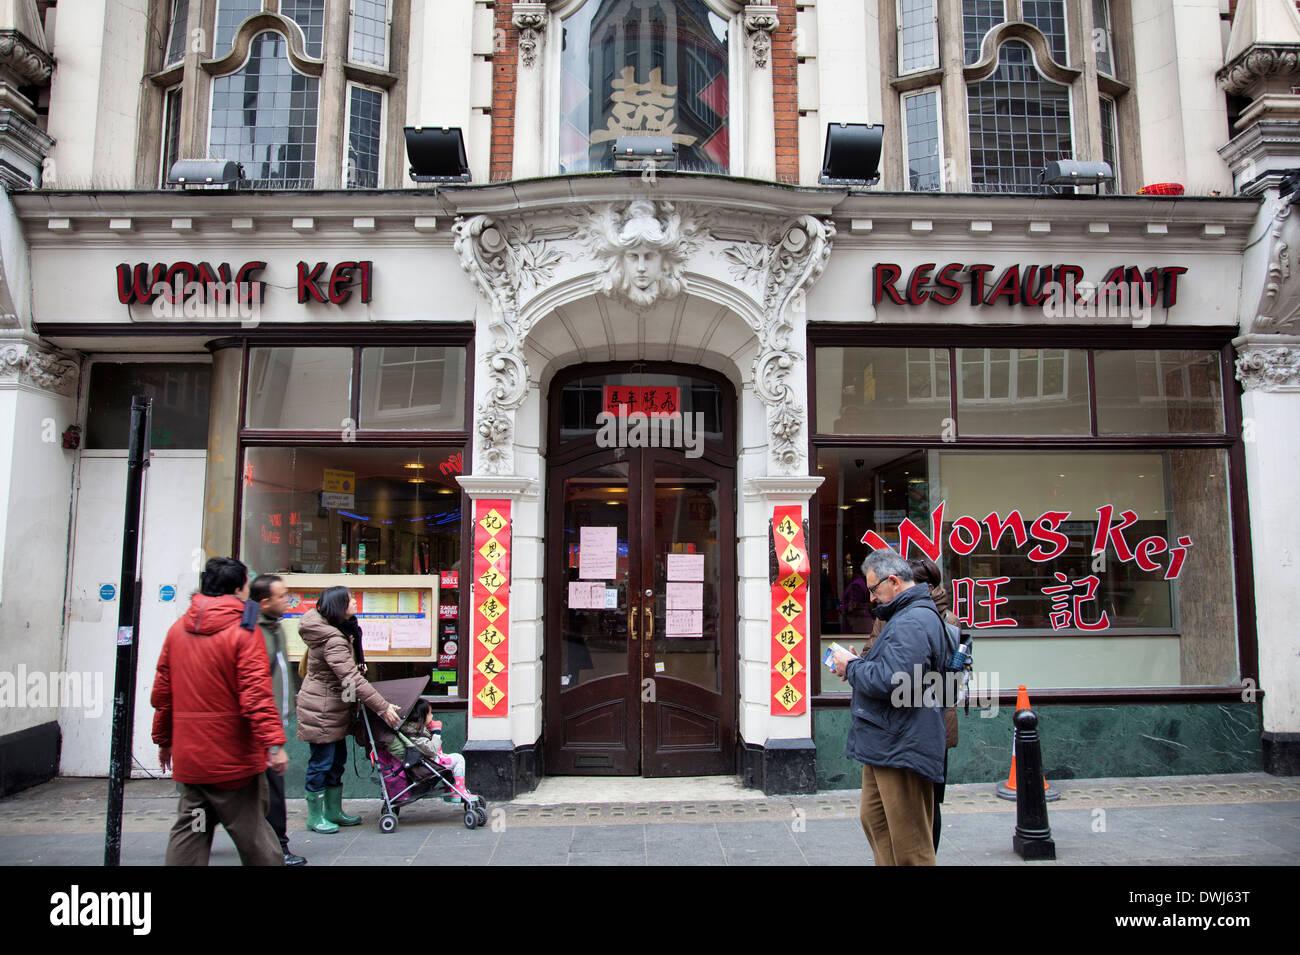 Wong Kei Restaurant on Wardour Street in West End - London UK - Stock Image